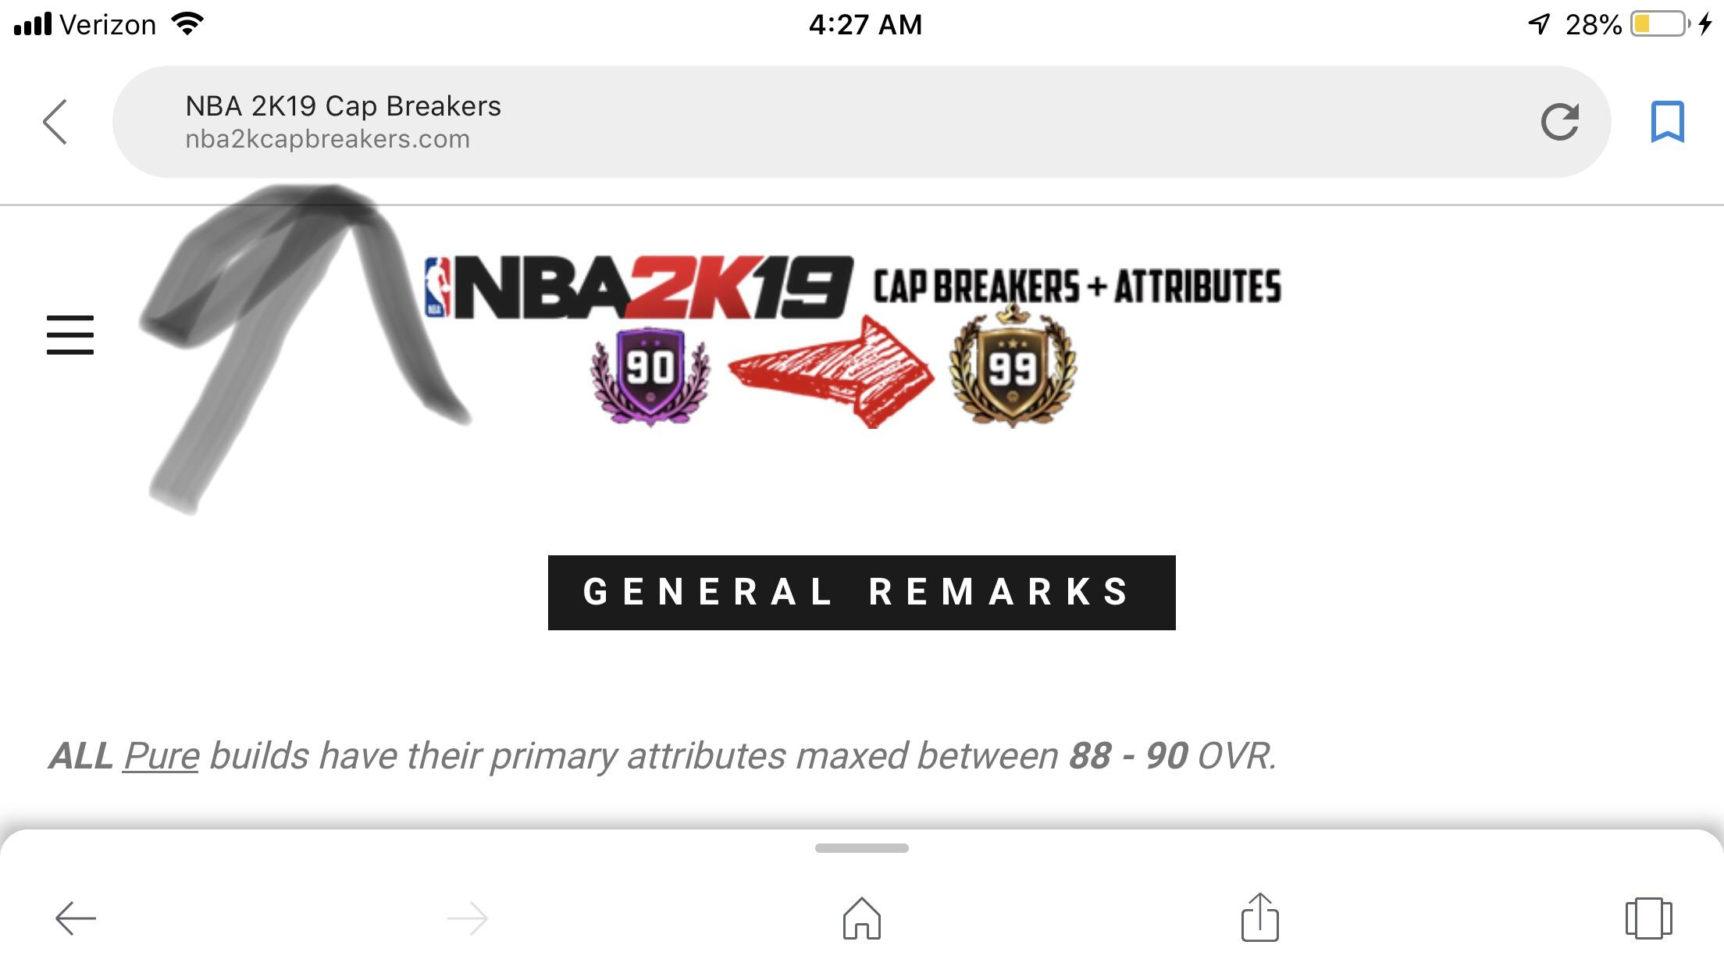 Nba 2K19 Badges Spreadsheet Intended For Nba 2K19 Cap Breaker Spreadsheet  Swfoodies